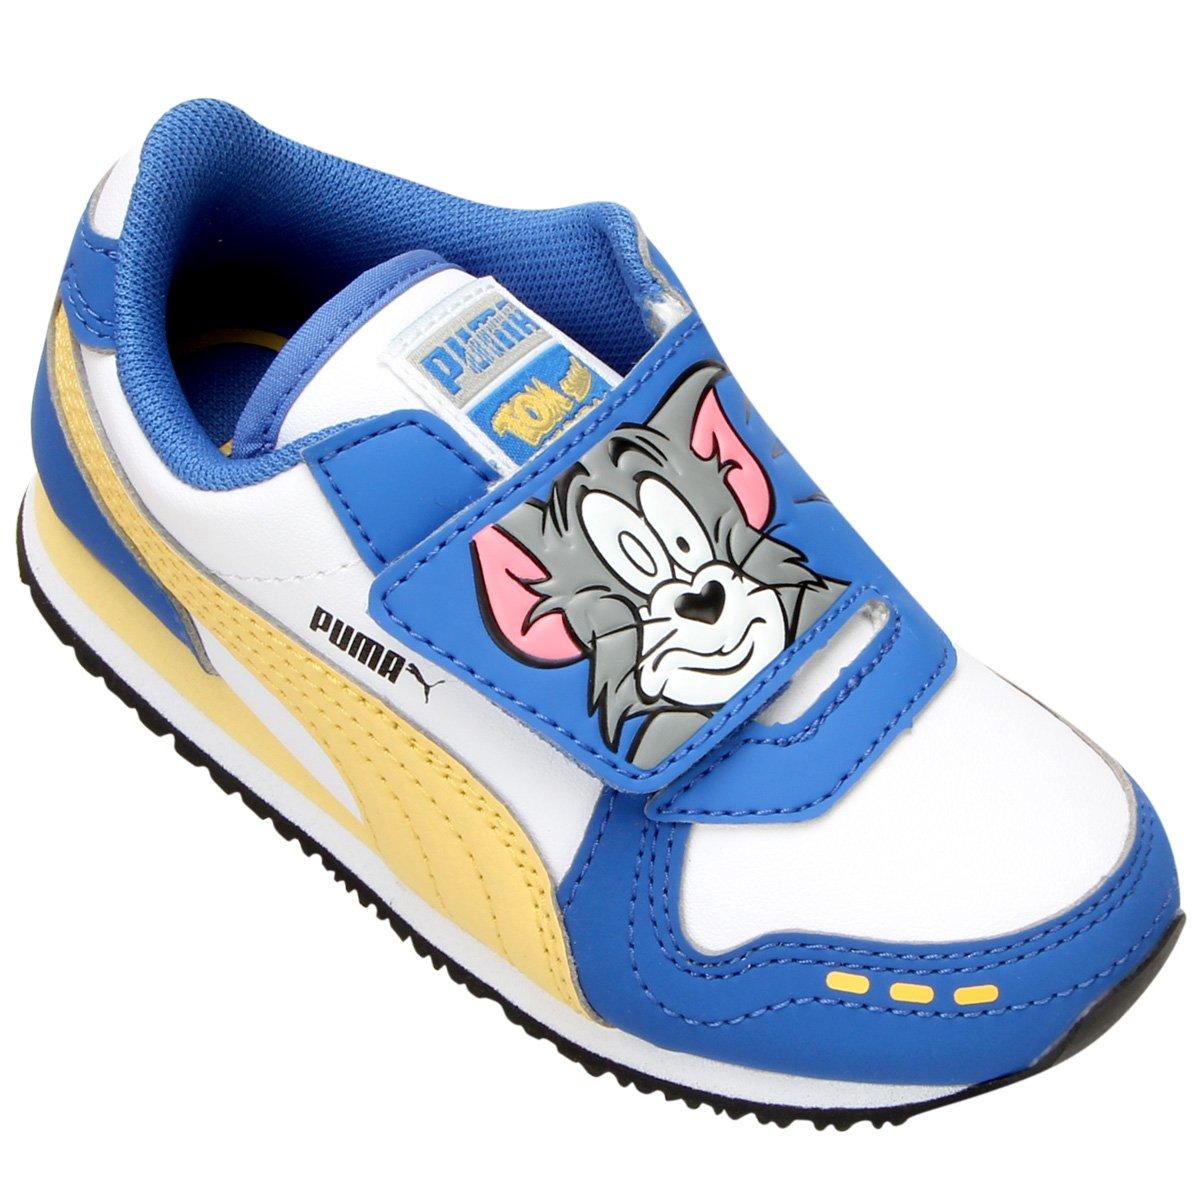 6d97b0b61497a Tênis Puma Cabana Racer Tom & Jerry Infantil | Zattini